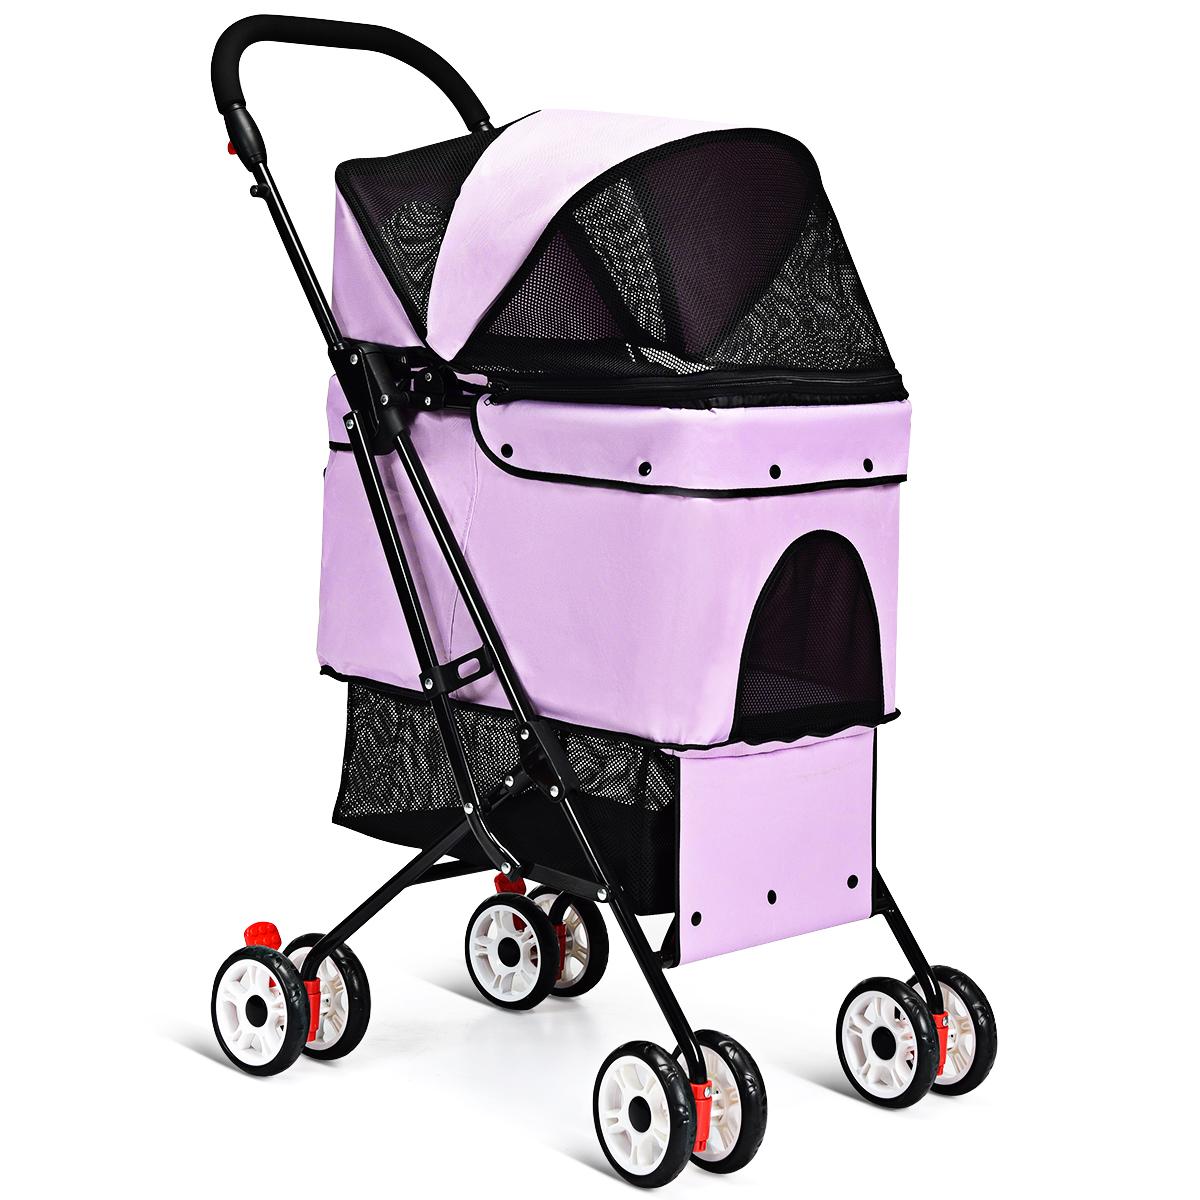 Pets Stroller Portable for Cat Dog Cage Stroller Travel Fold